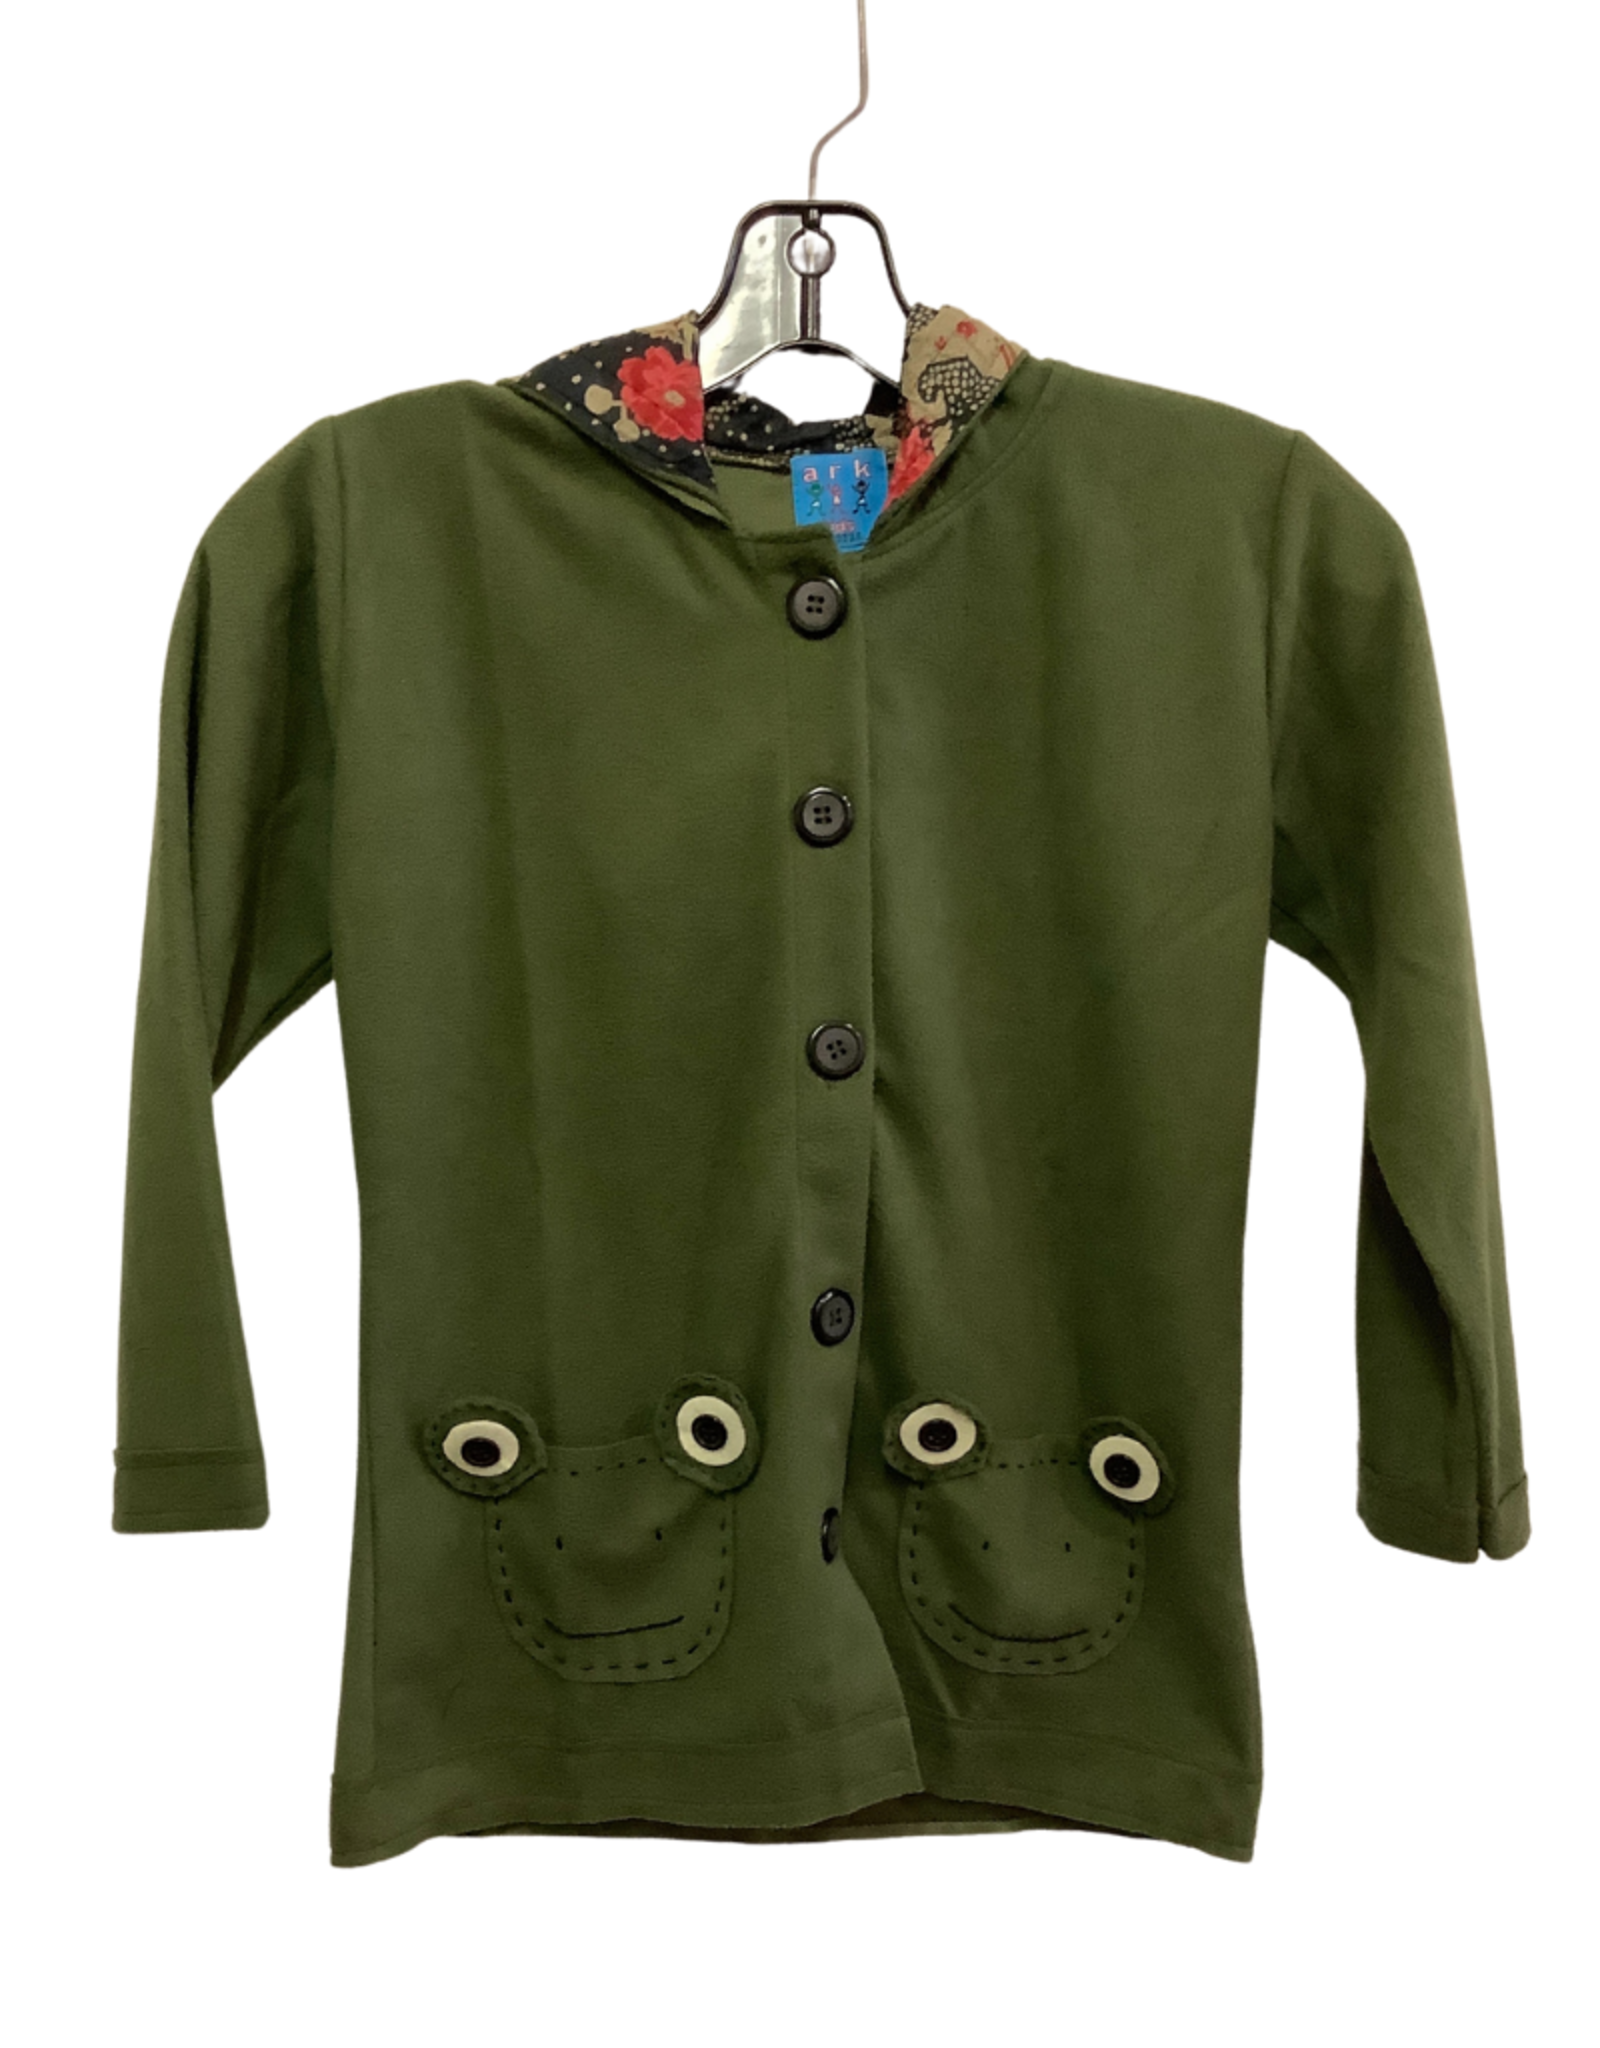 Child's Fleece Jacket, Green